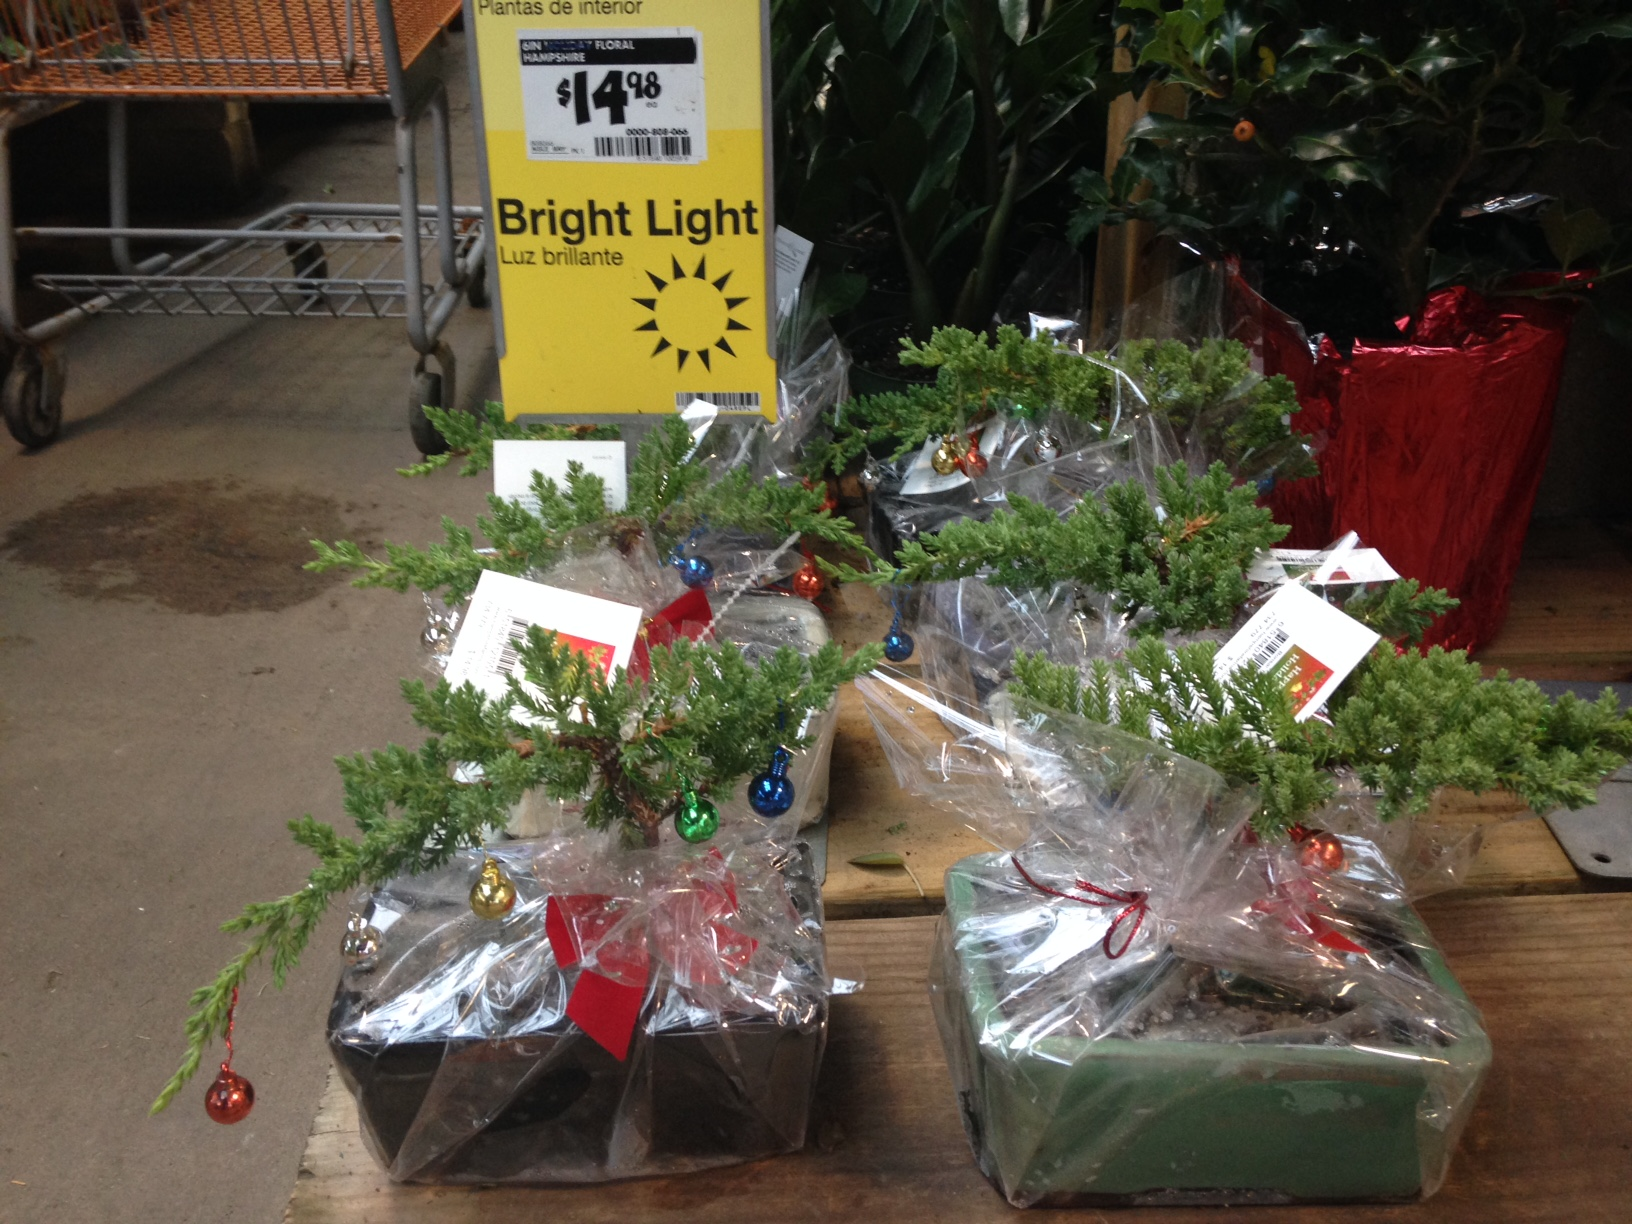 PHOTO: Juniper bonsai for sale at a large garden center.